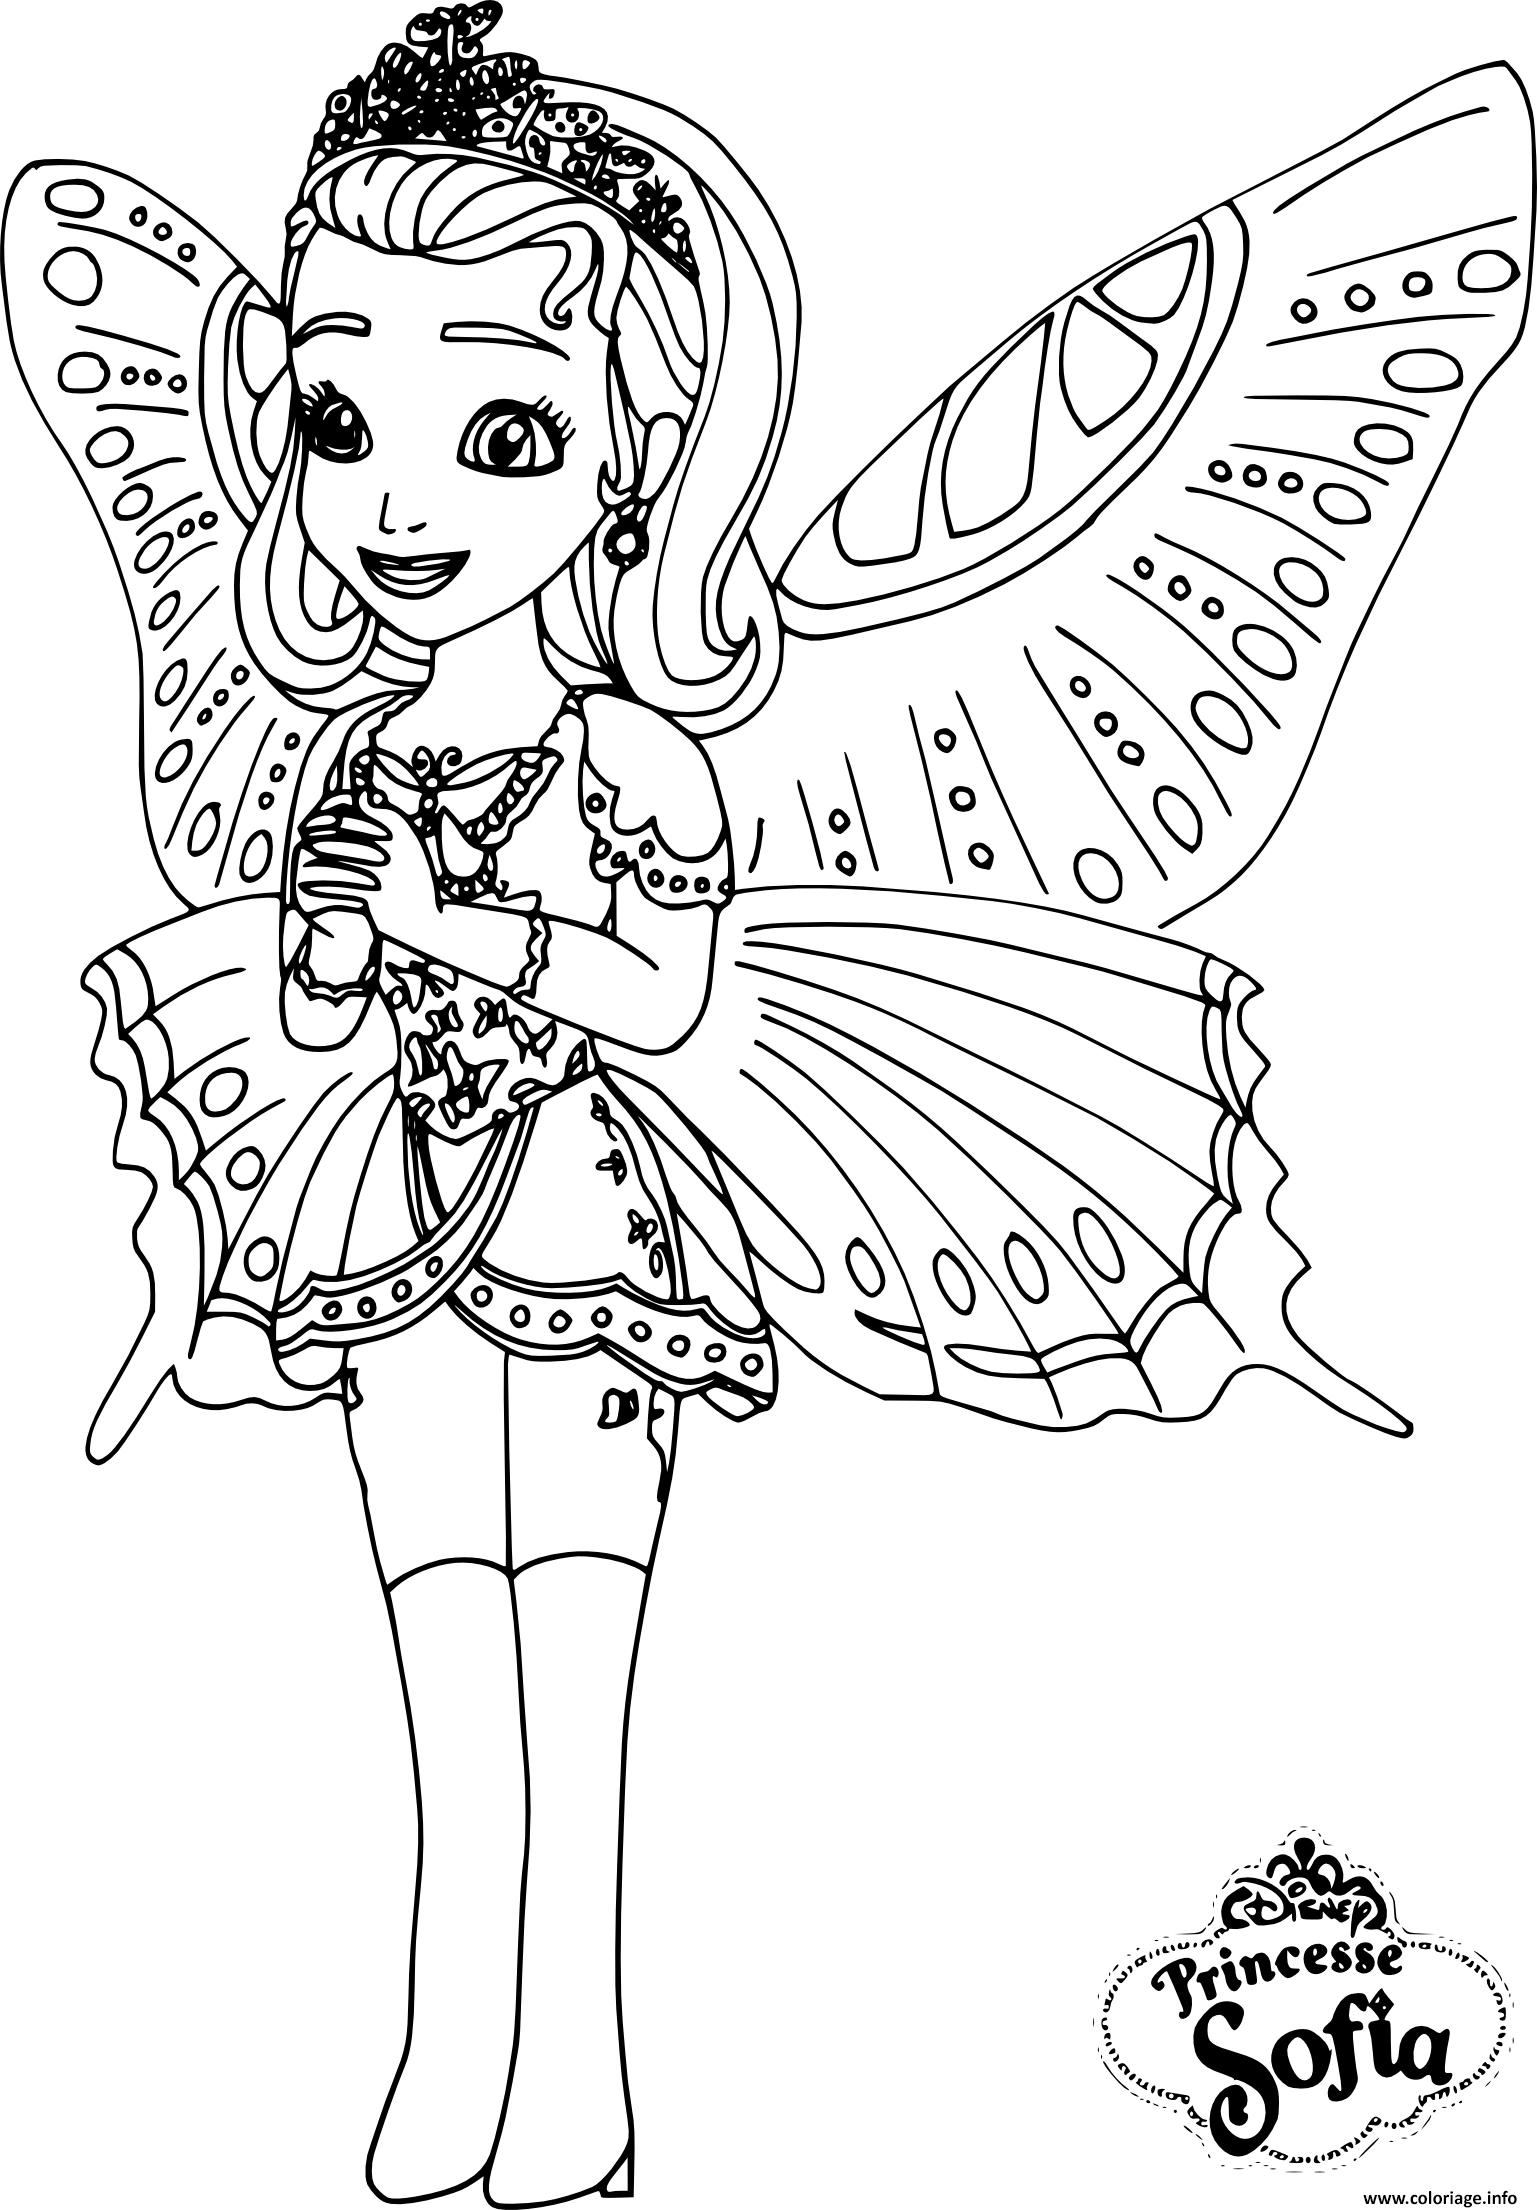 Coloriage Gratuit Princesse Sofia.Coloriage Princesse Sofia Papillon Jecolorie Com